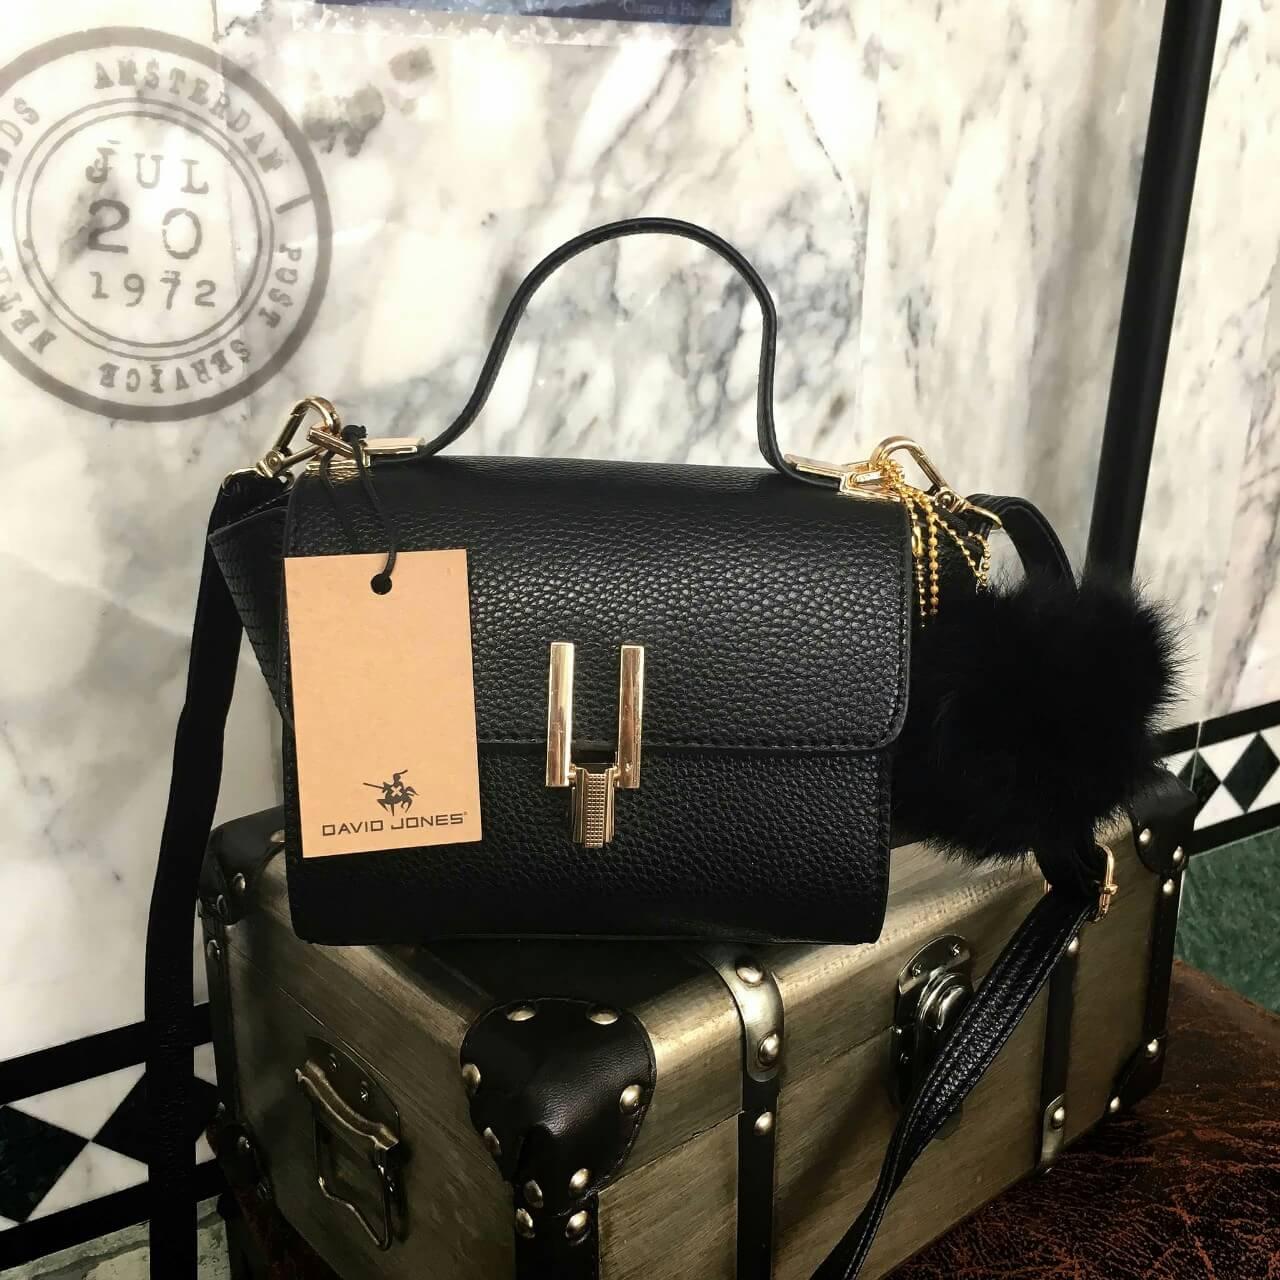 HOT PROMOTION - กระเป๋า David Jones Mini Calssic Black ราคา 1,290 บาท Free Ems